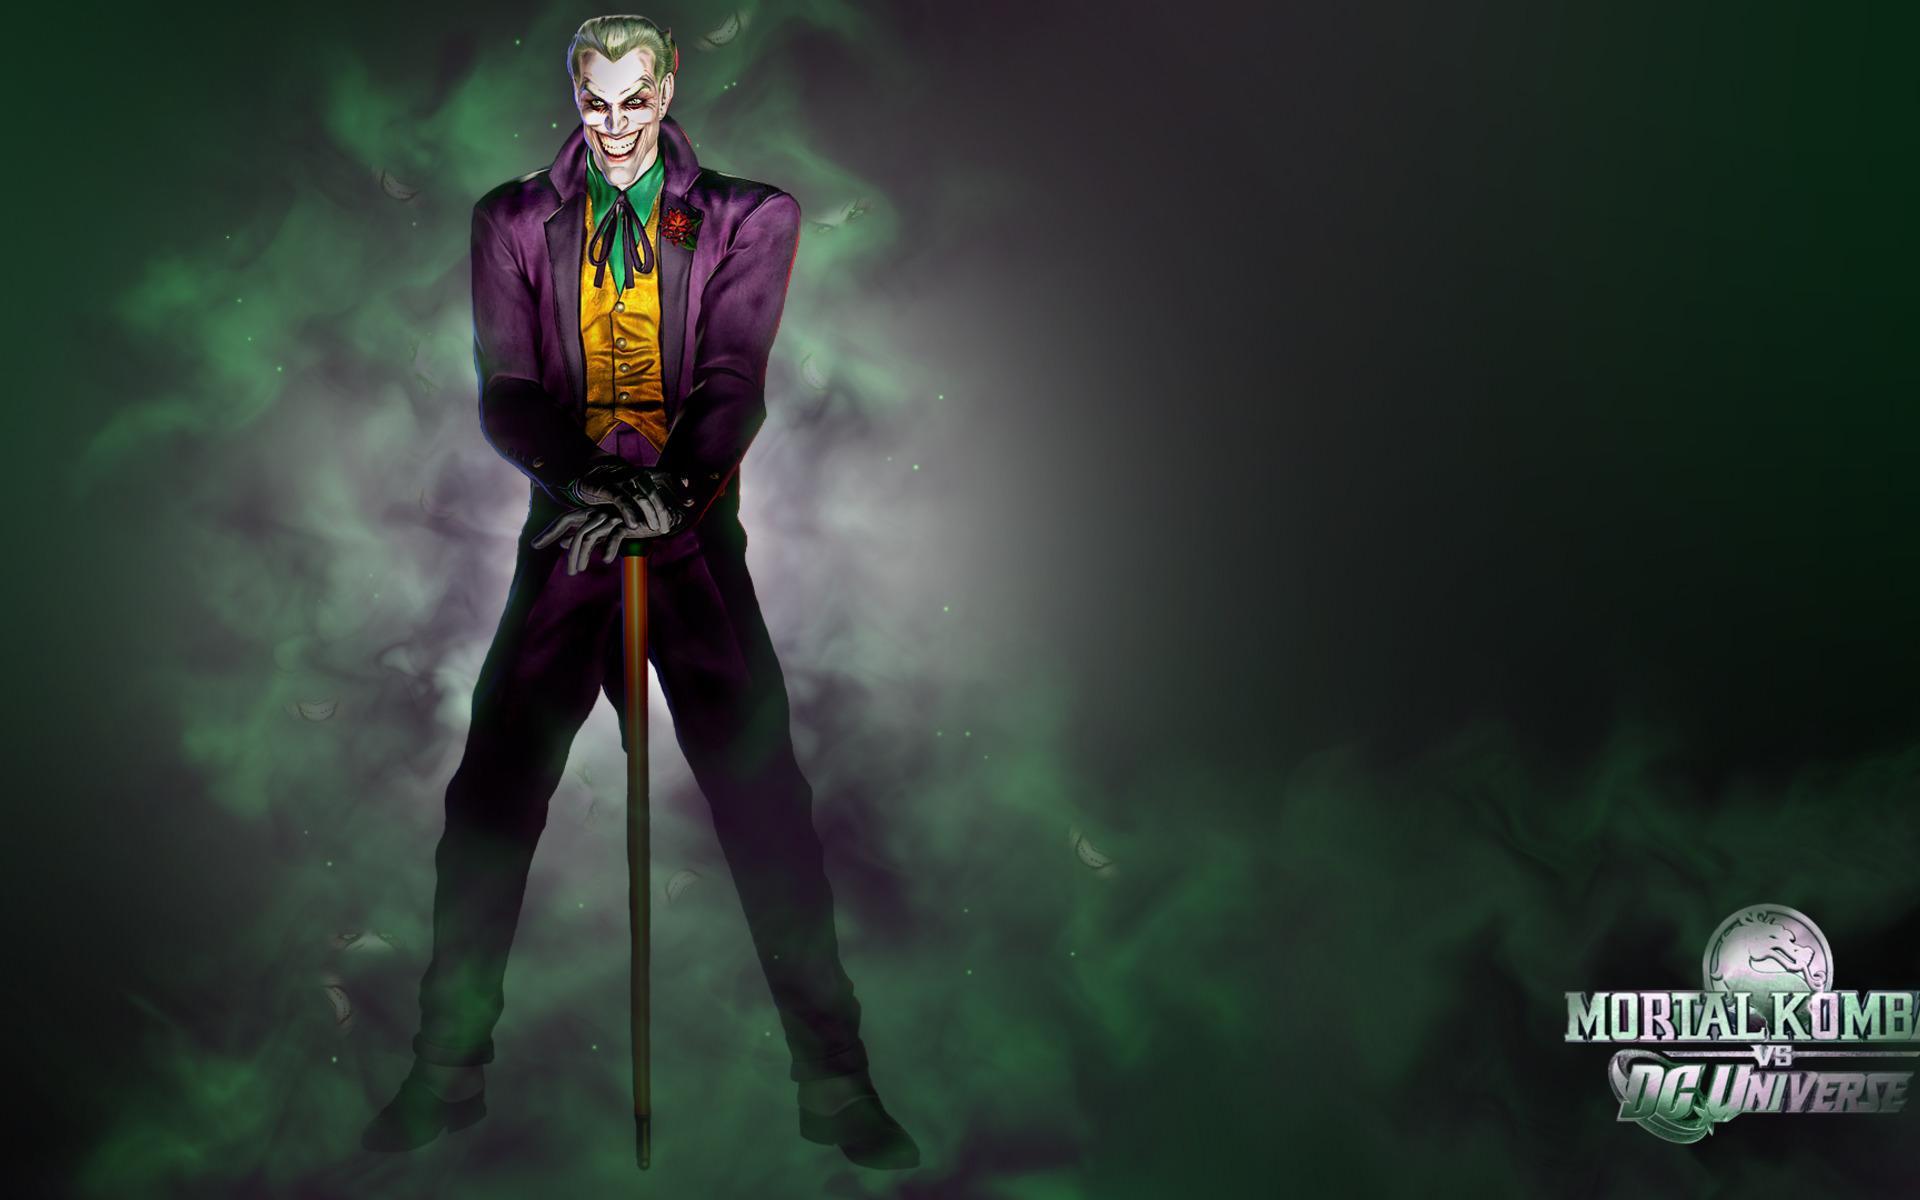 Joker Cartoon Wallpapers Top Free Joker Cartoon